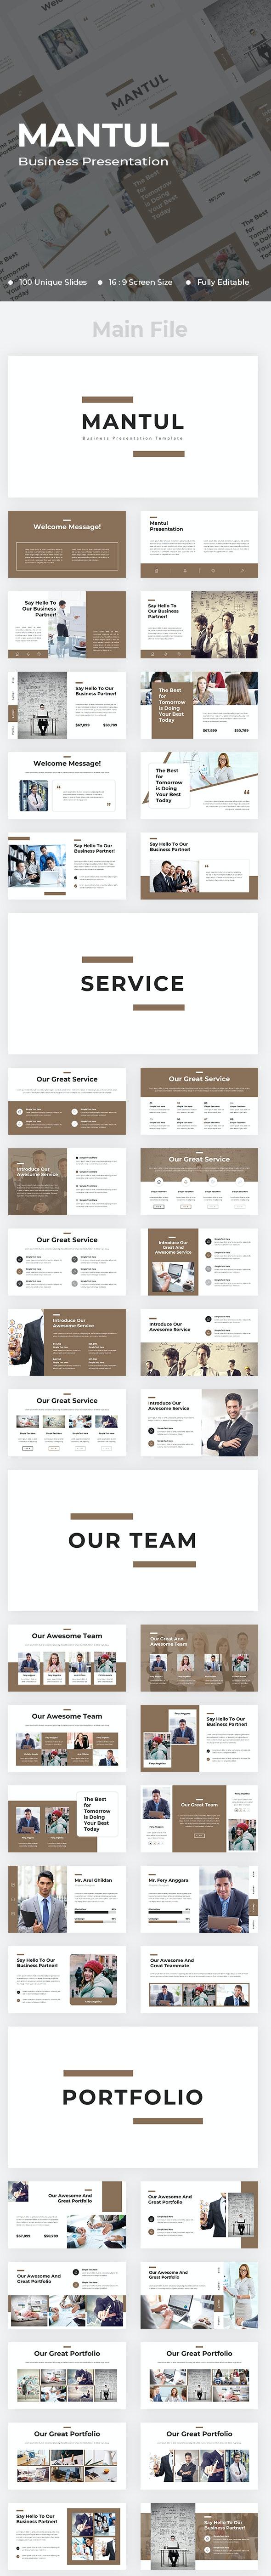 Mantul Business Google Slides - Google Slides Presentation Templates